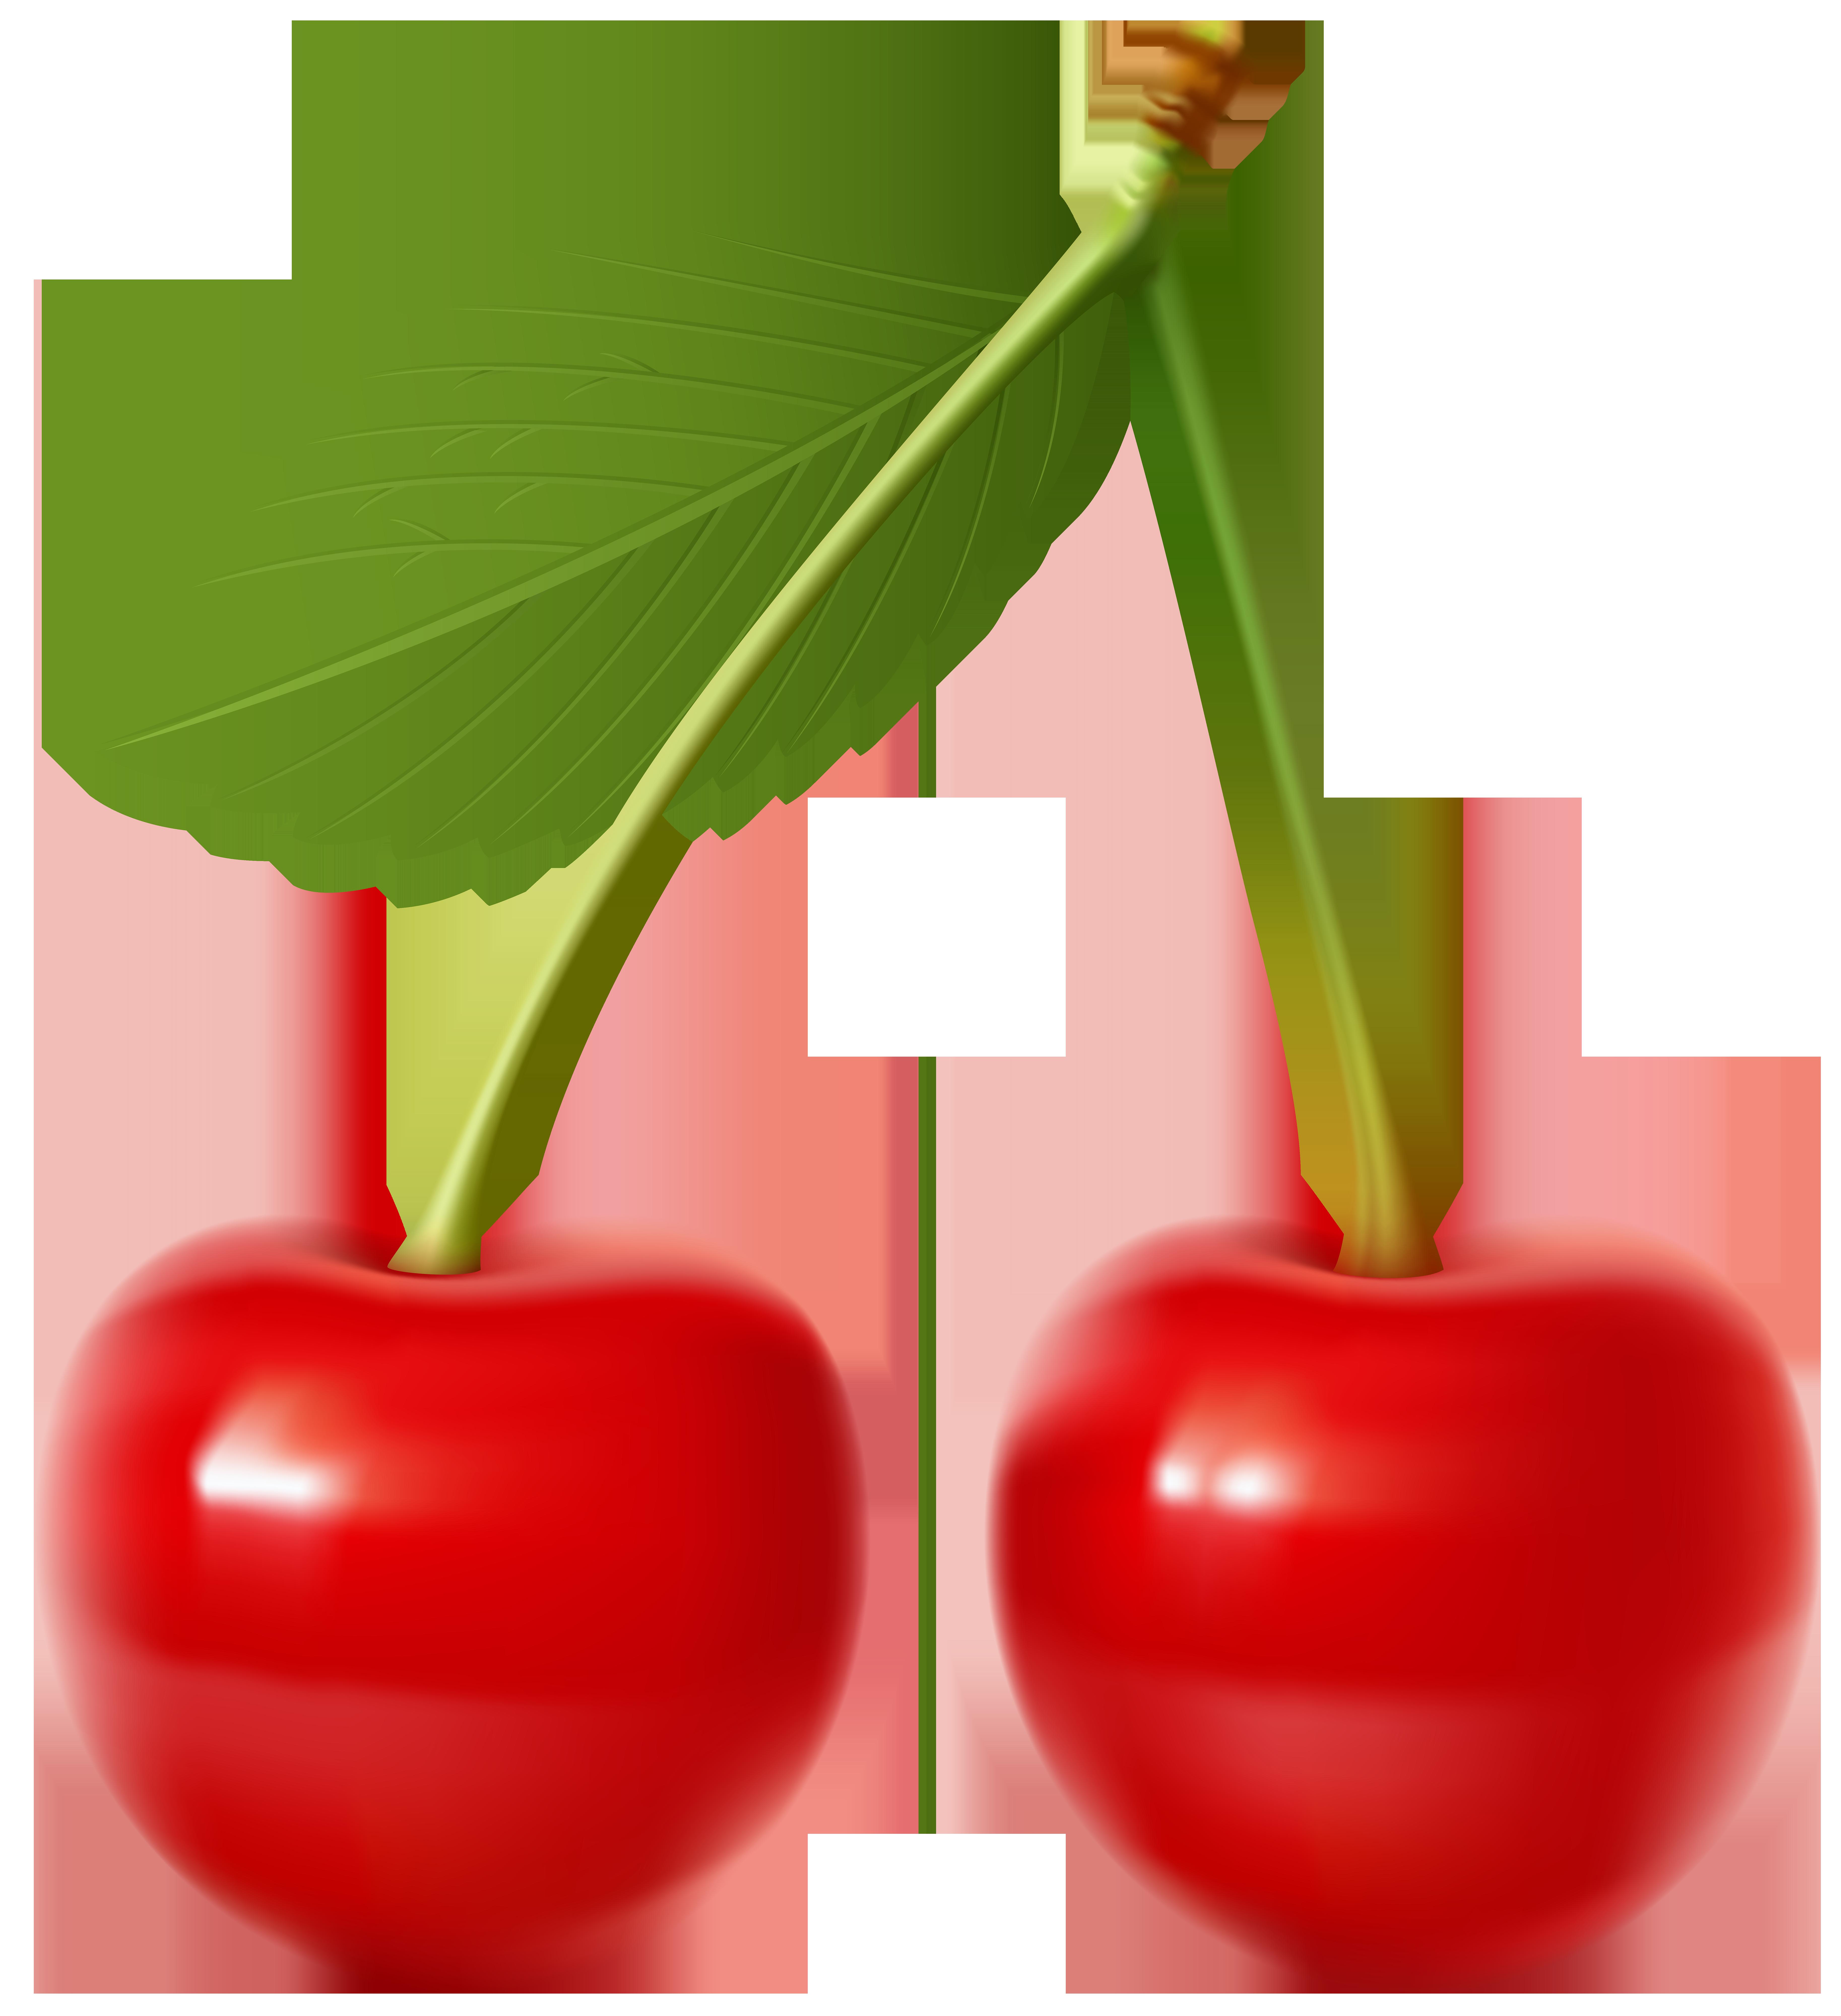 Cherries Transparent Clip Art Image.